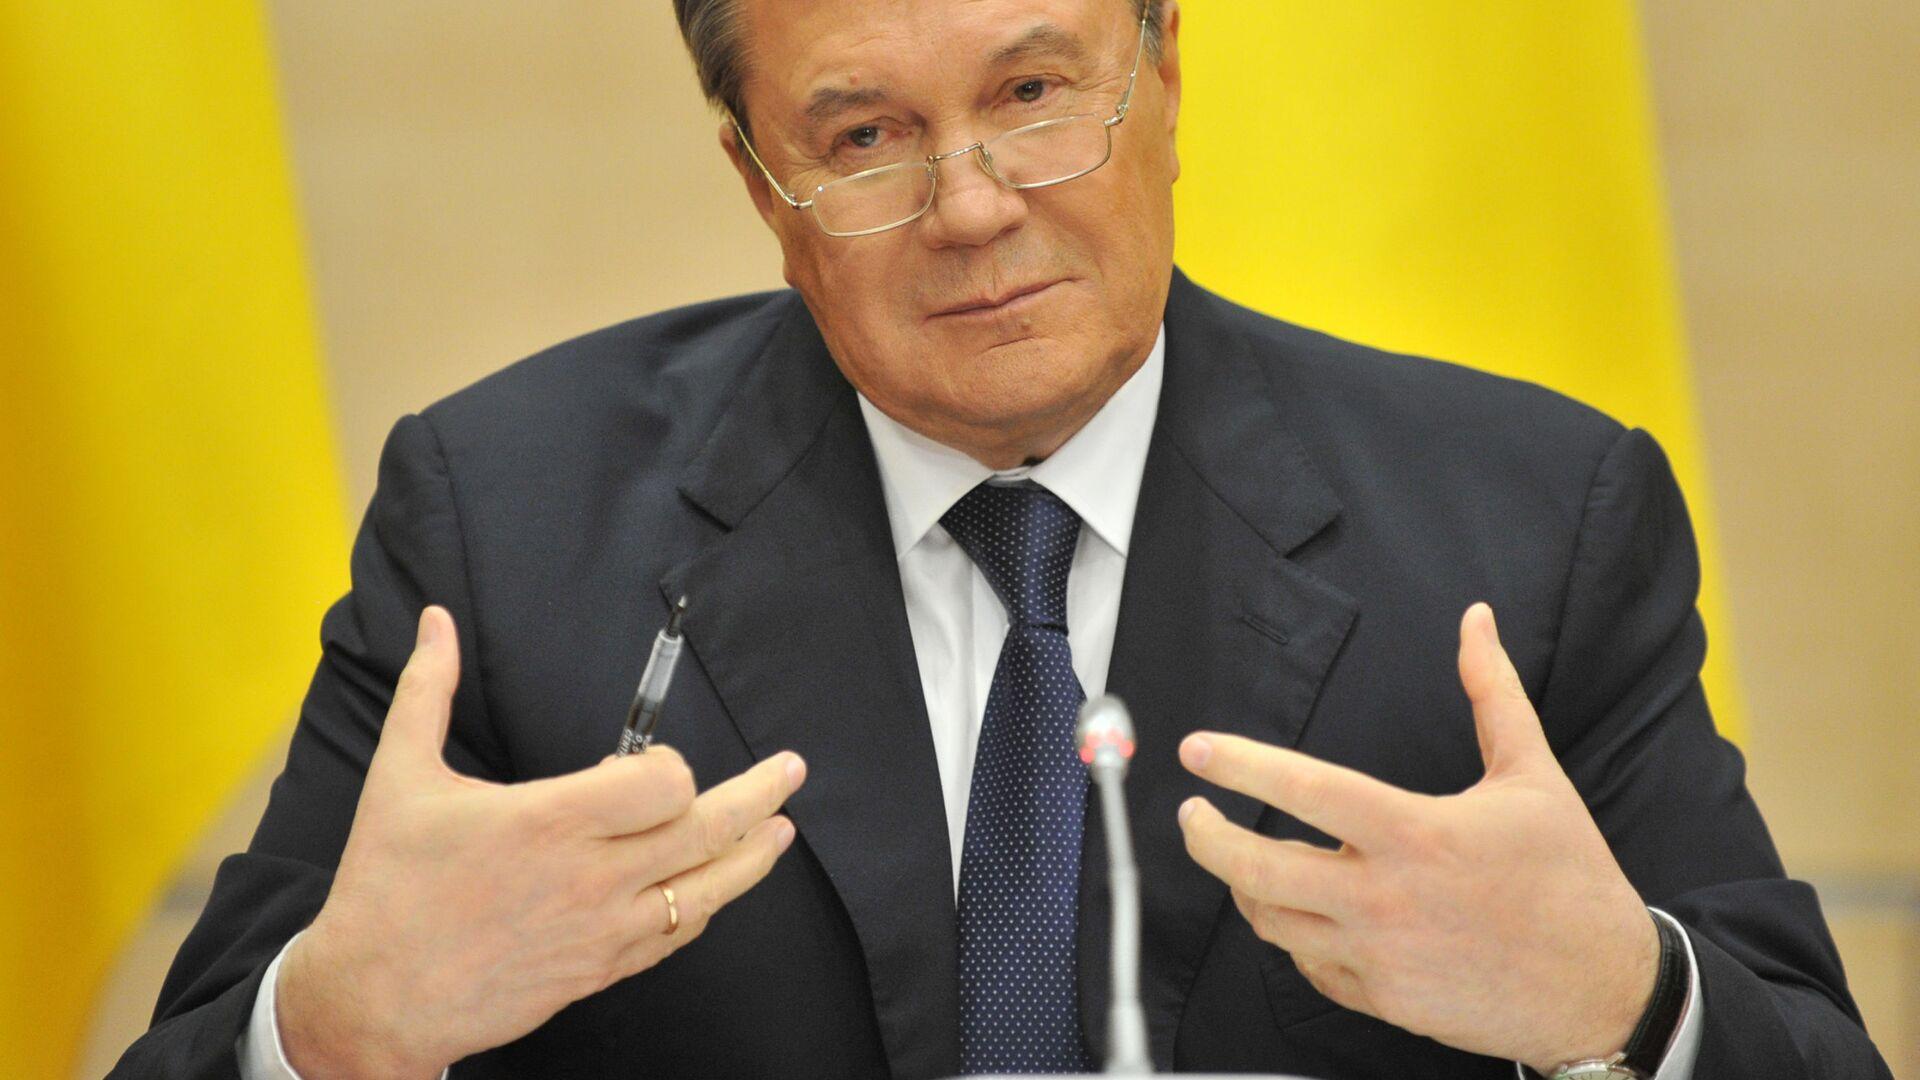 Były prezydent Ukrainy Wiktor Janukowycz  - Sputnik Polska, 1920, 07.10.2021